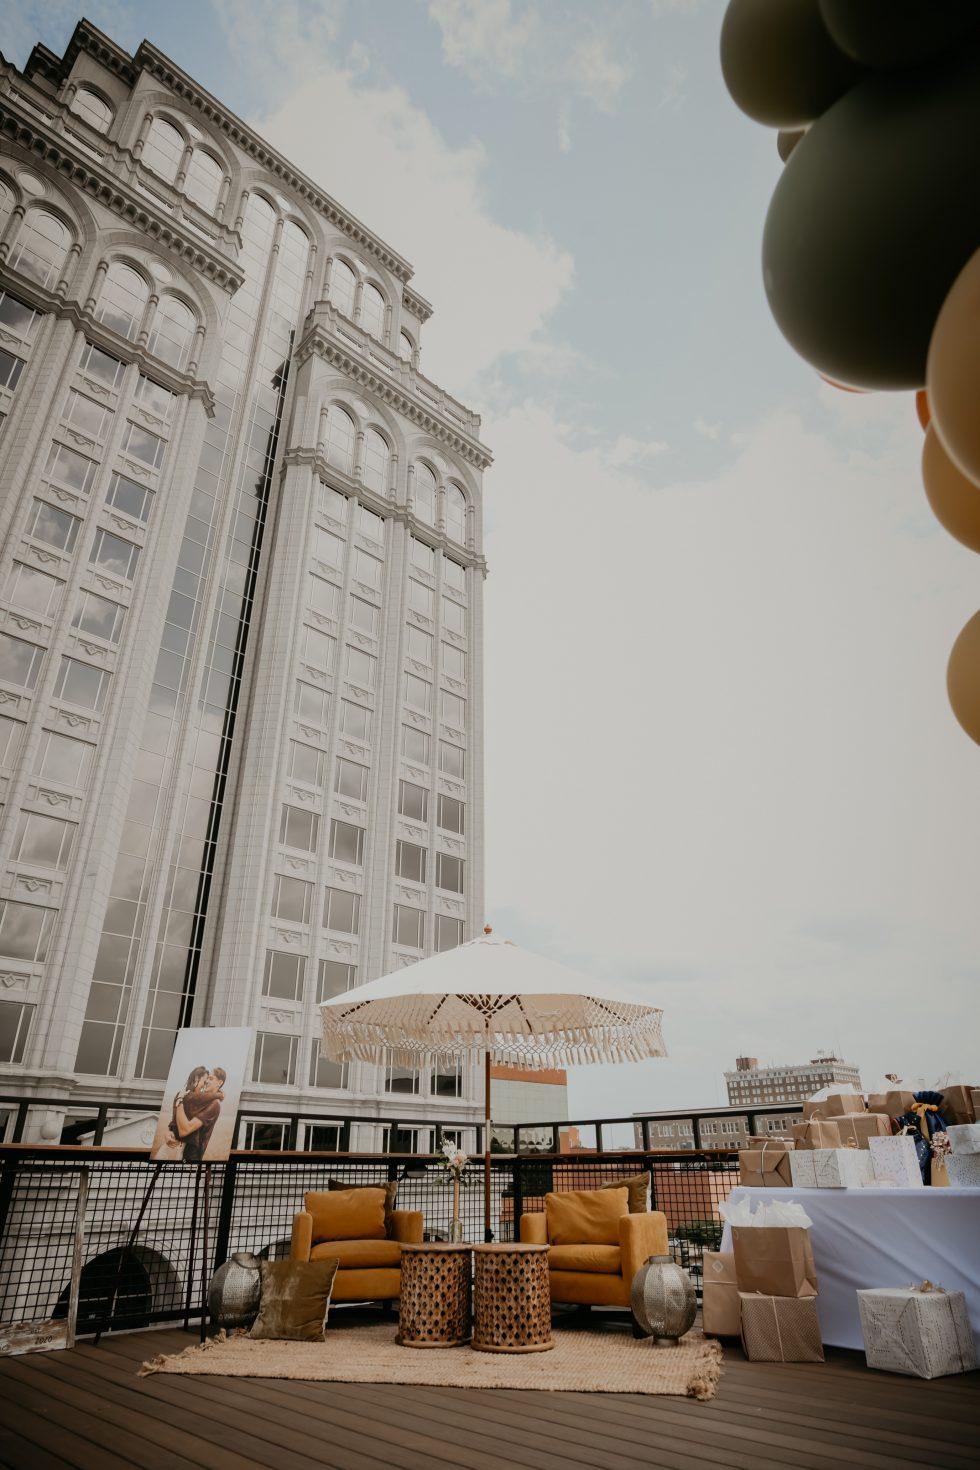 Kress-Terrace-Rooftop-Engagement-Party022